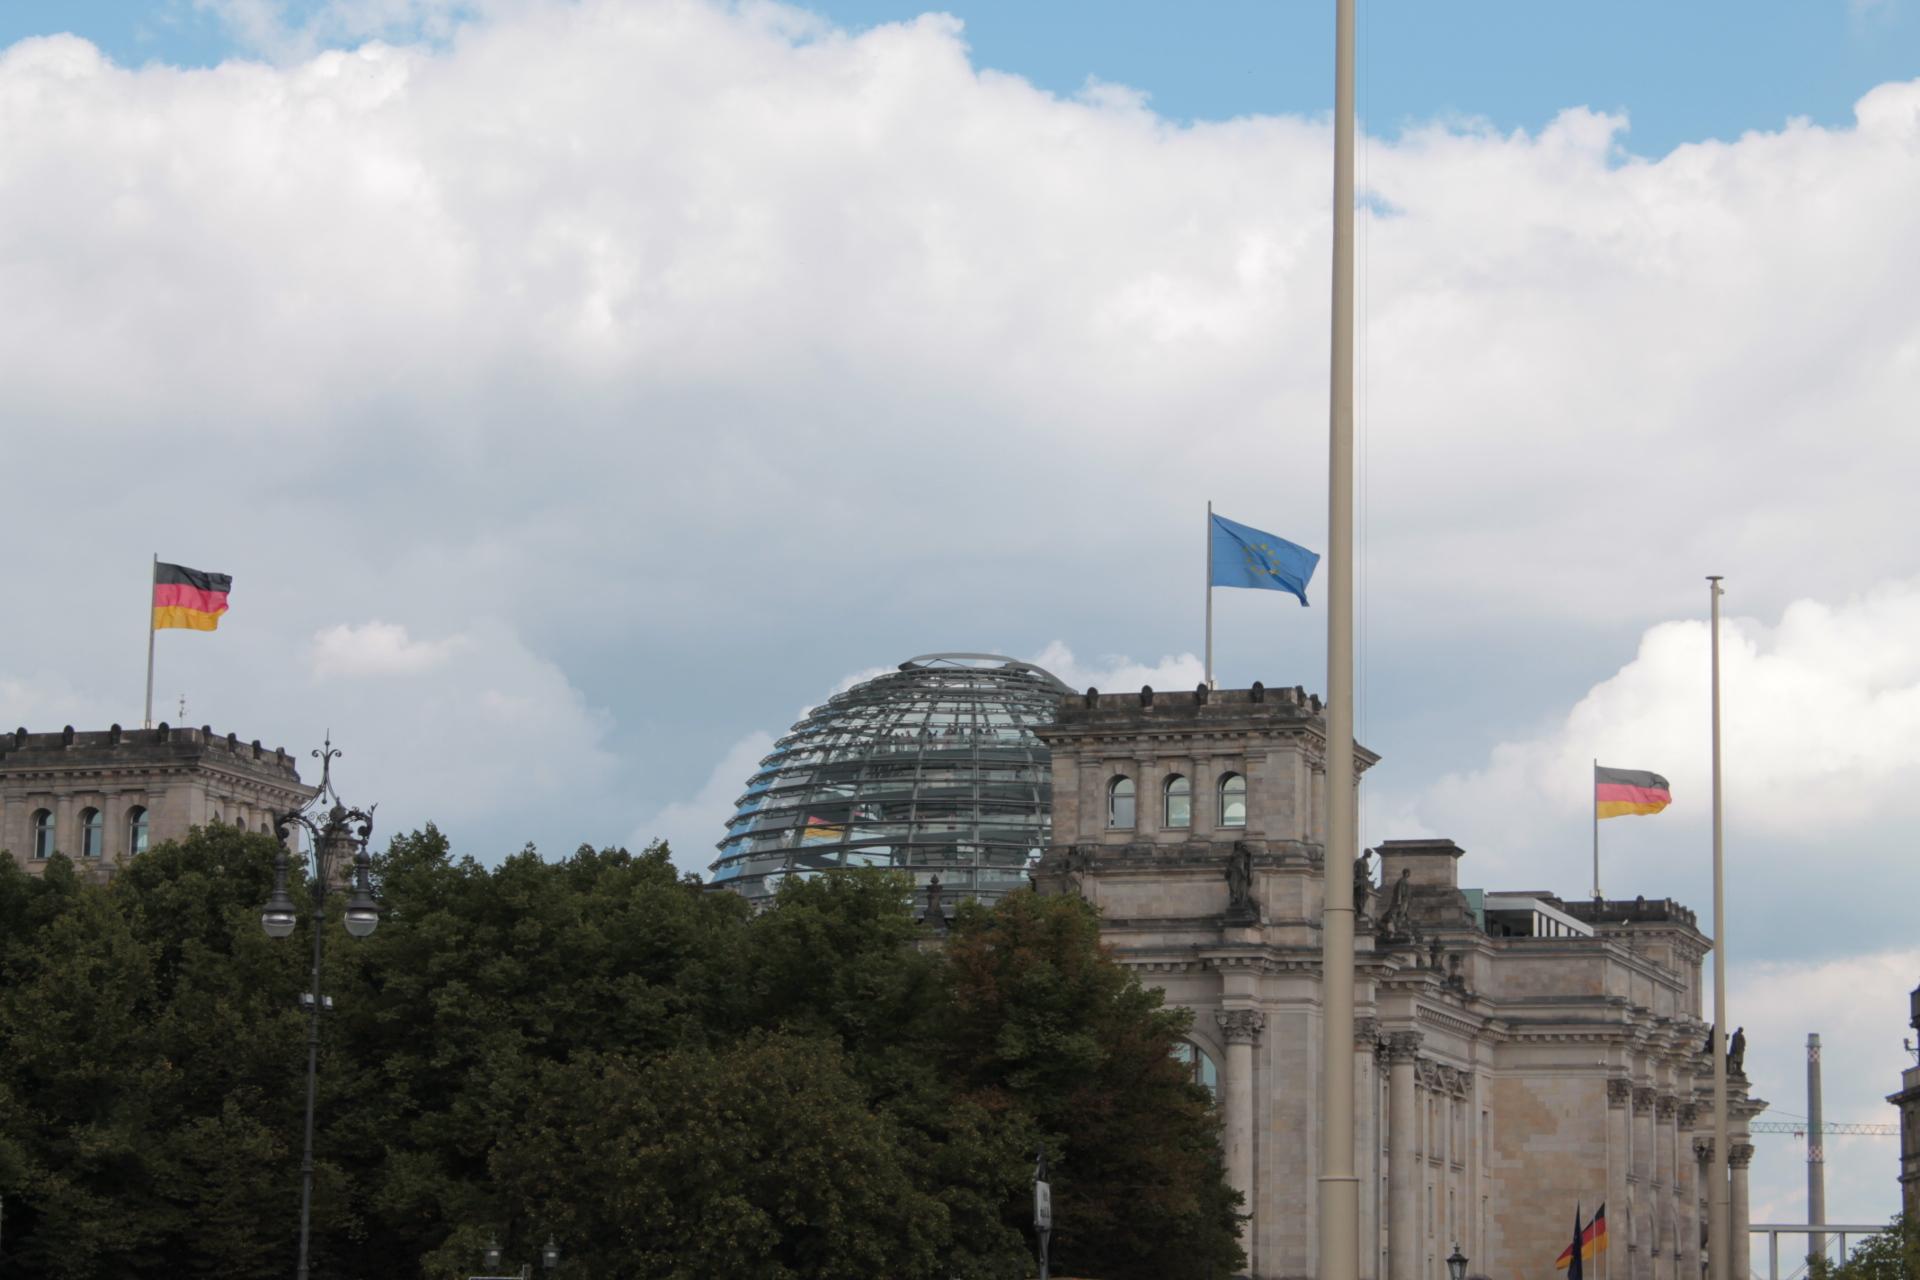 Parlamento Alemán - Bundestag o Reichtag